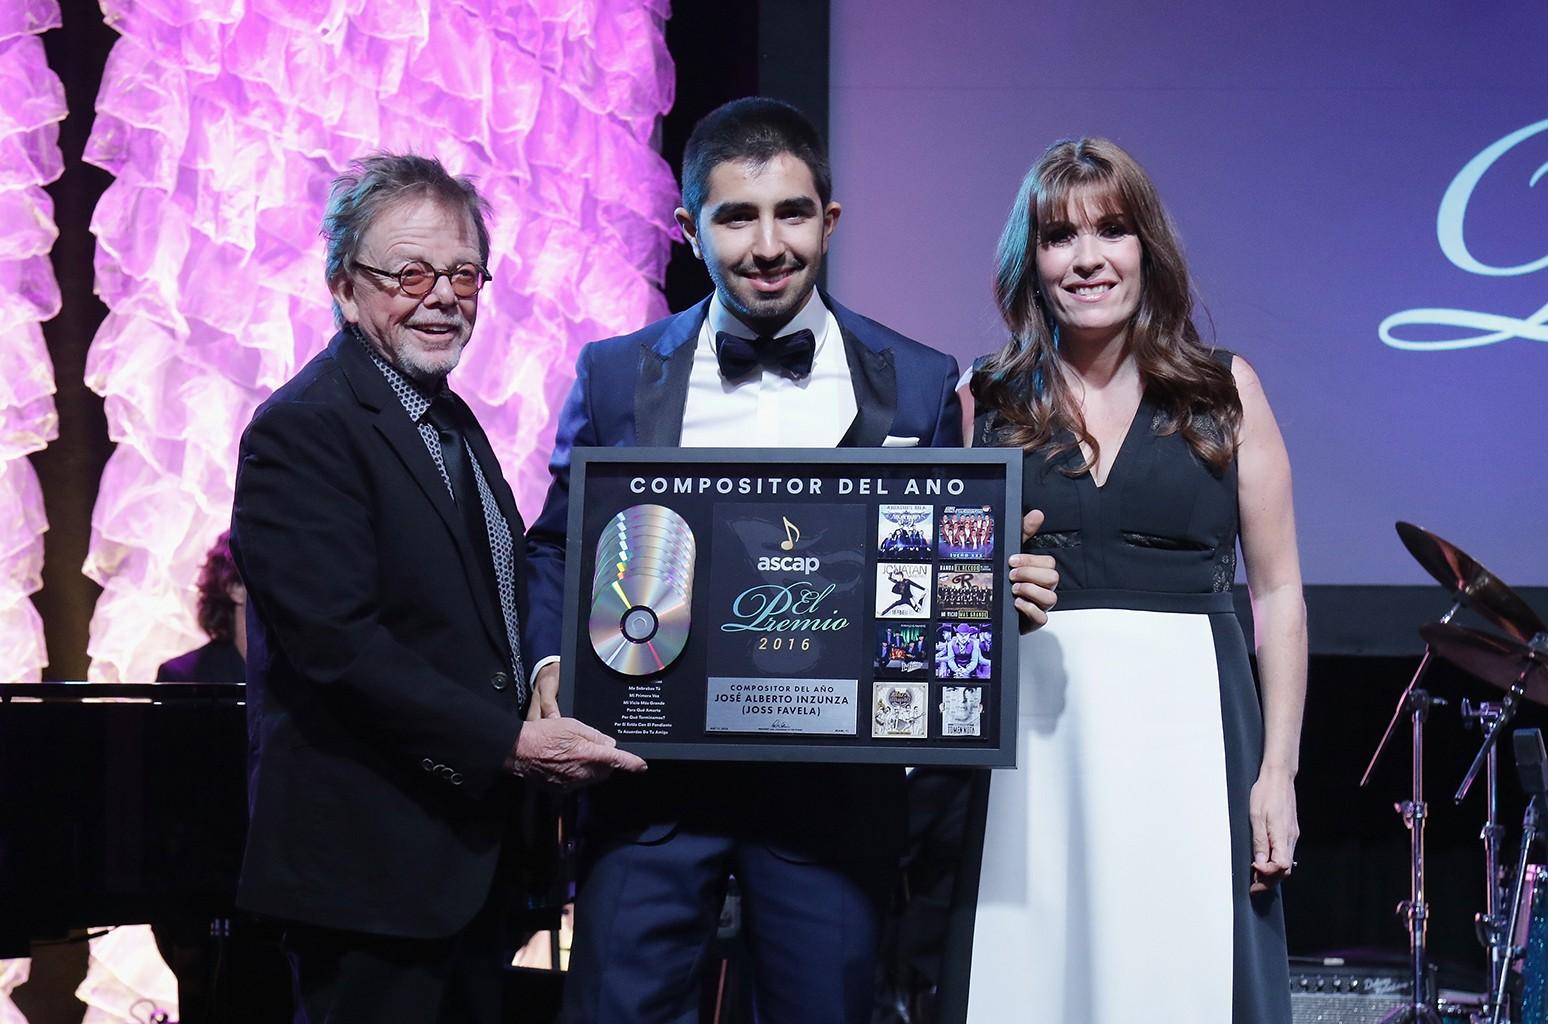 Joss Favela accepts an award from ASCAP at the Latin Music Awards